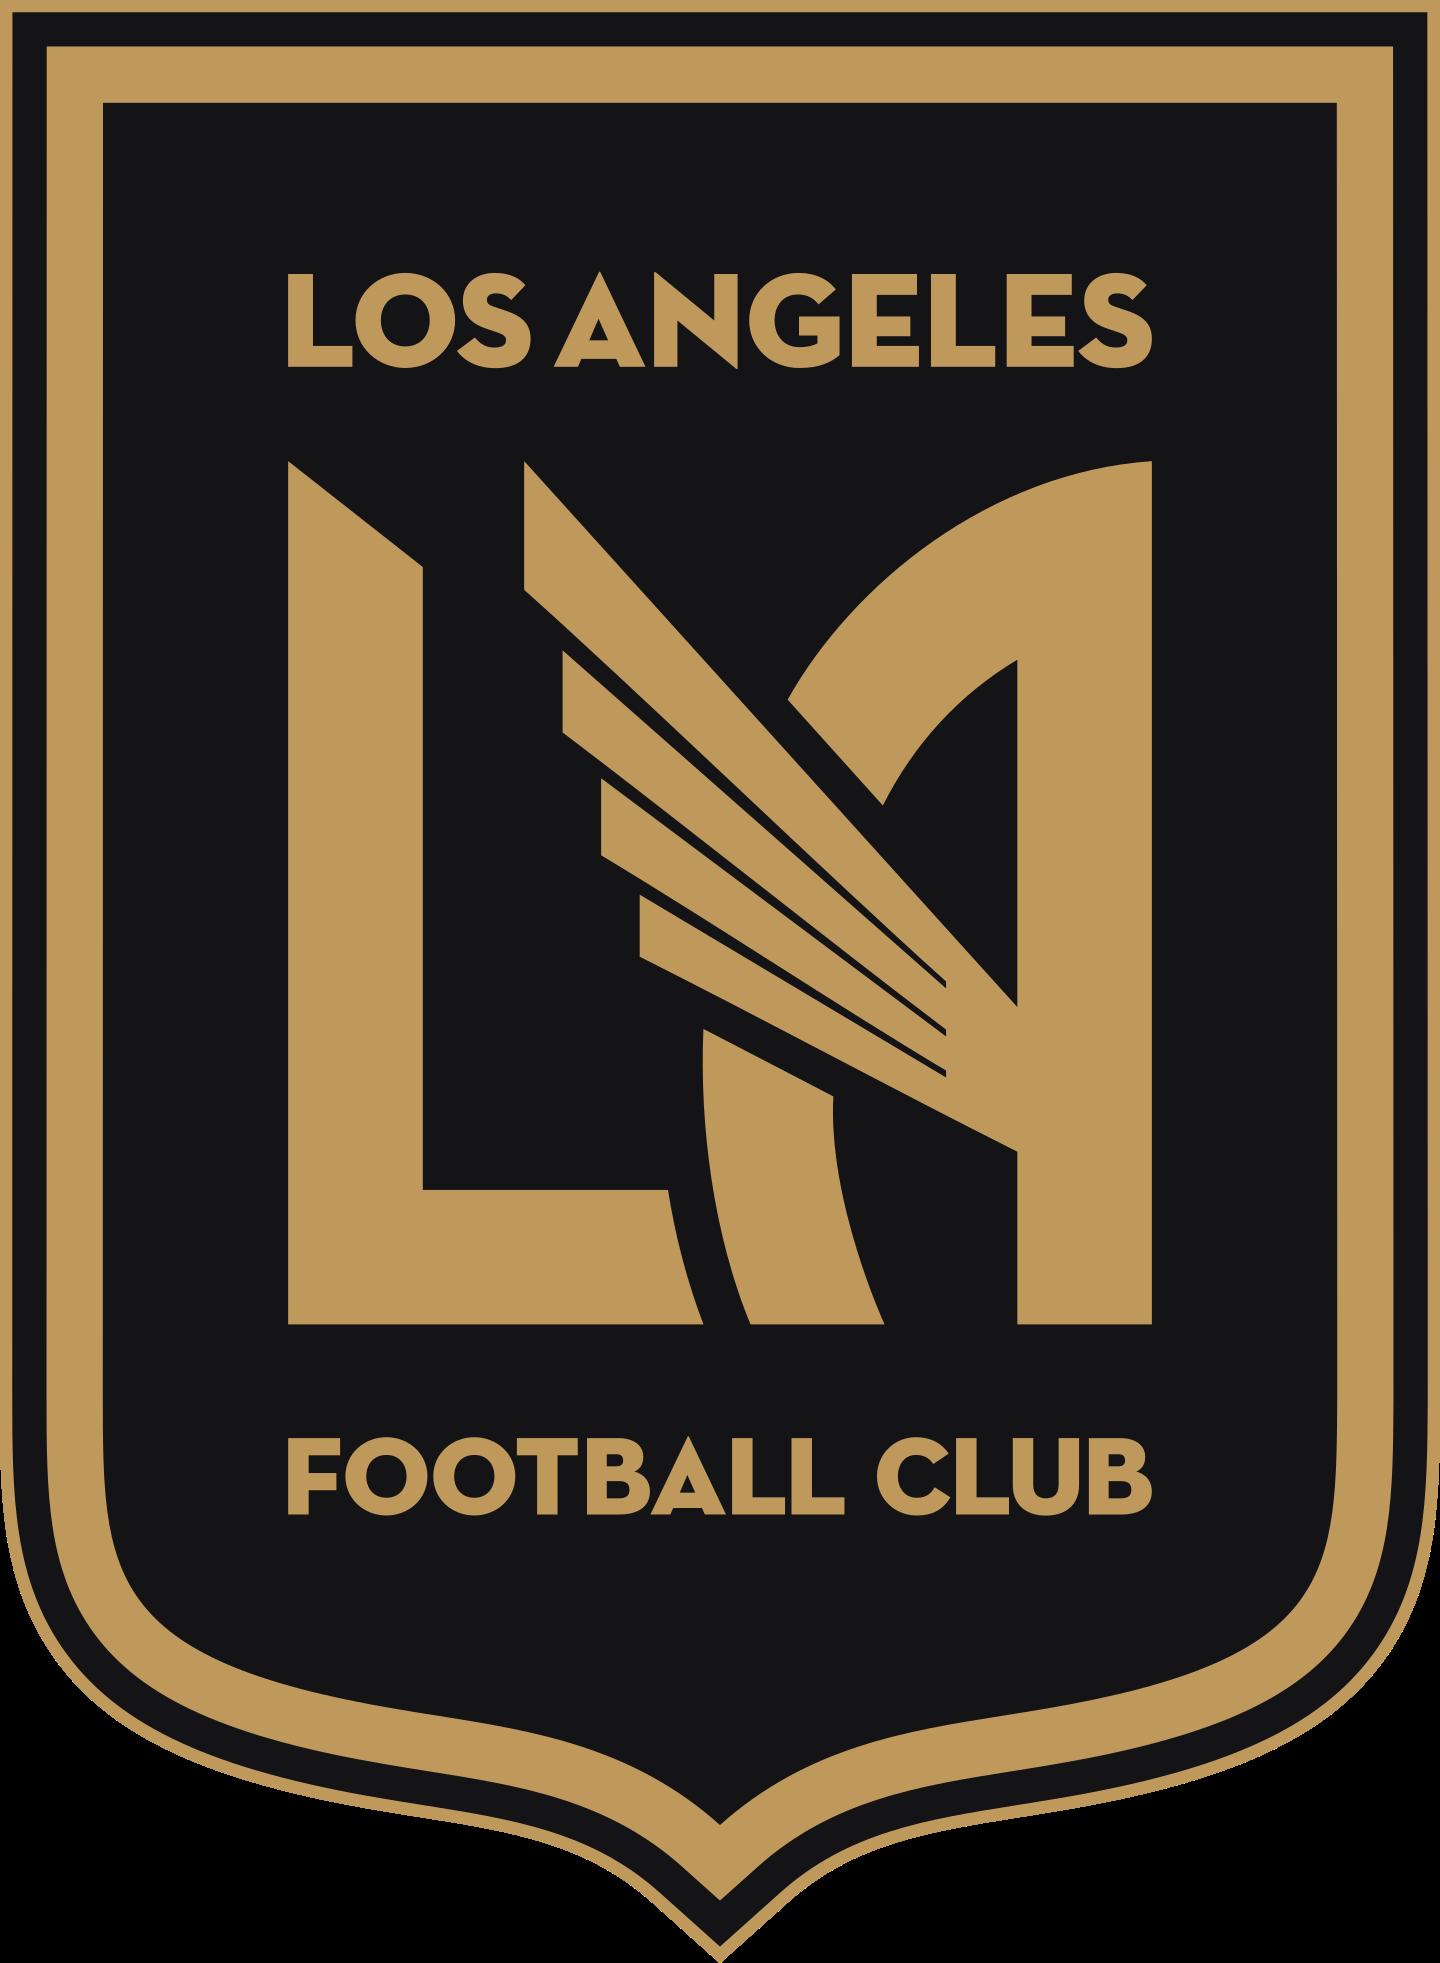 los angeles fc logo 2 - Los Angeles FC Logo